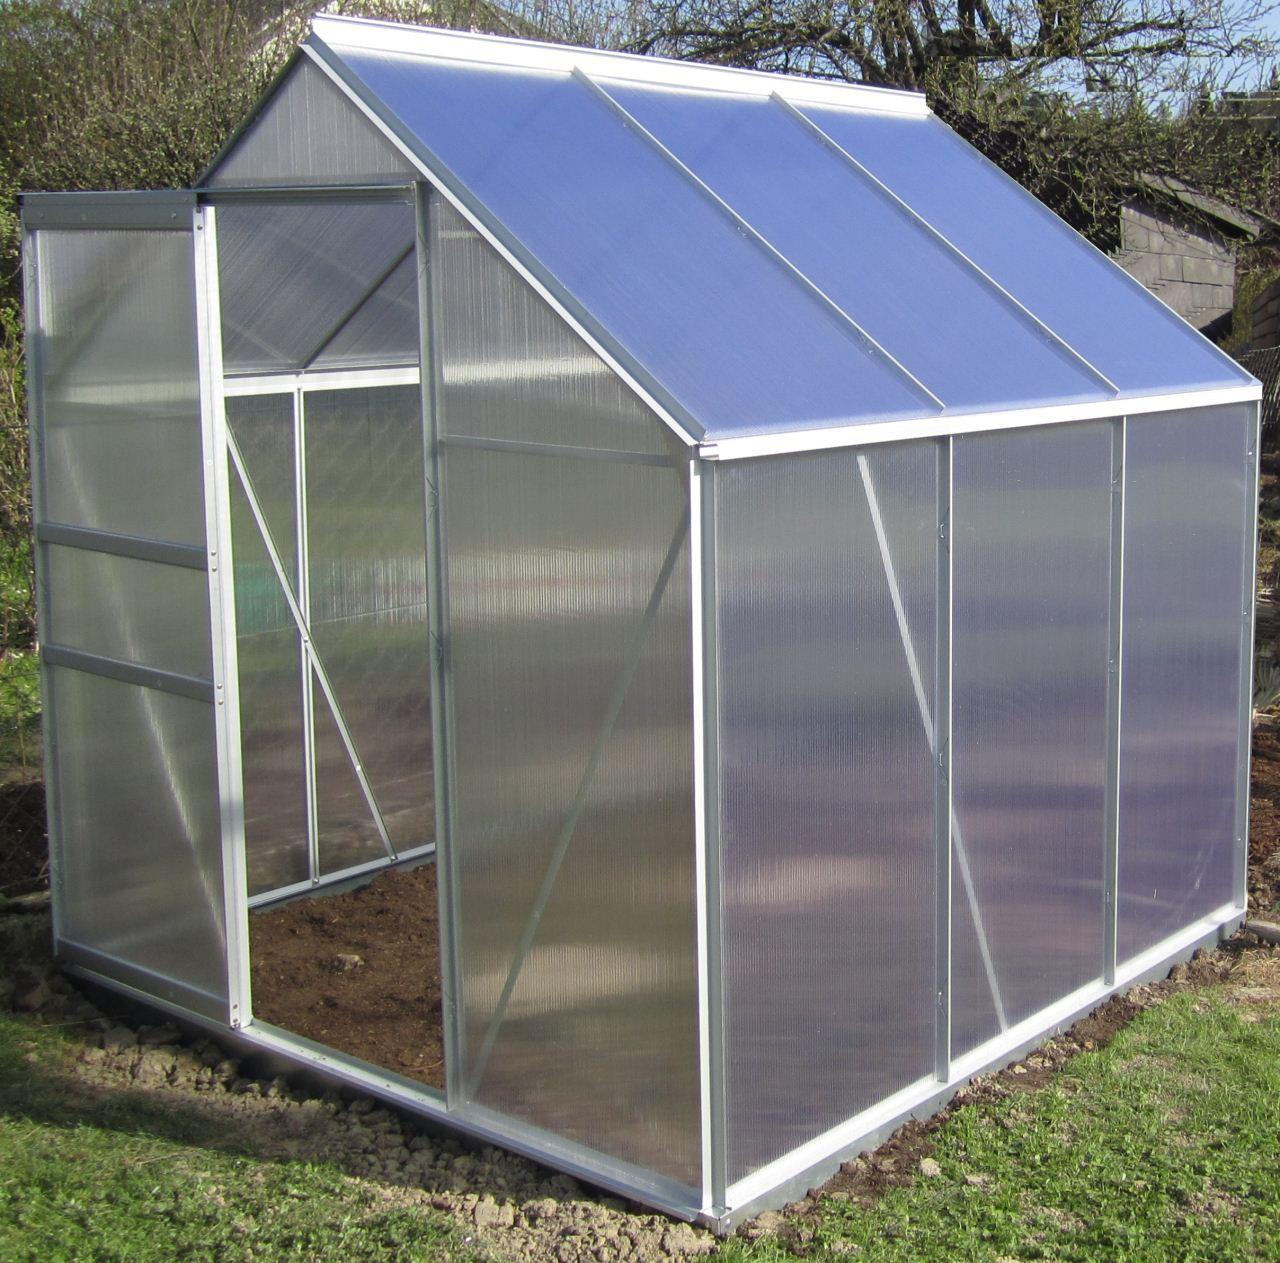 alu gew chshaus tomatenhaus glashaus 6mm stegplatten. Black Bedroom Furniture Sets. Home Design Ideas